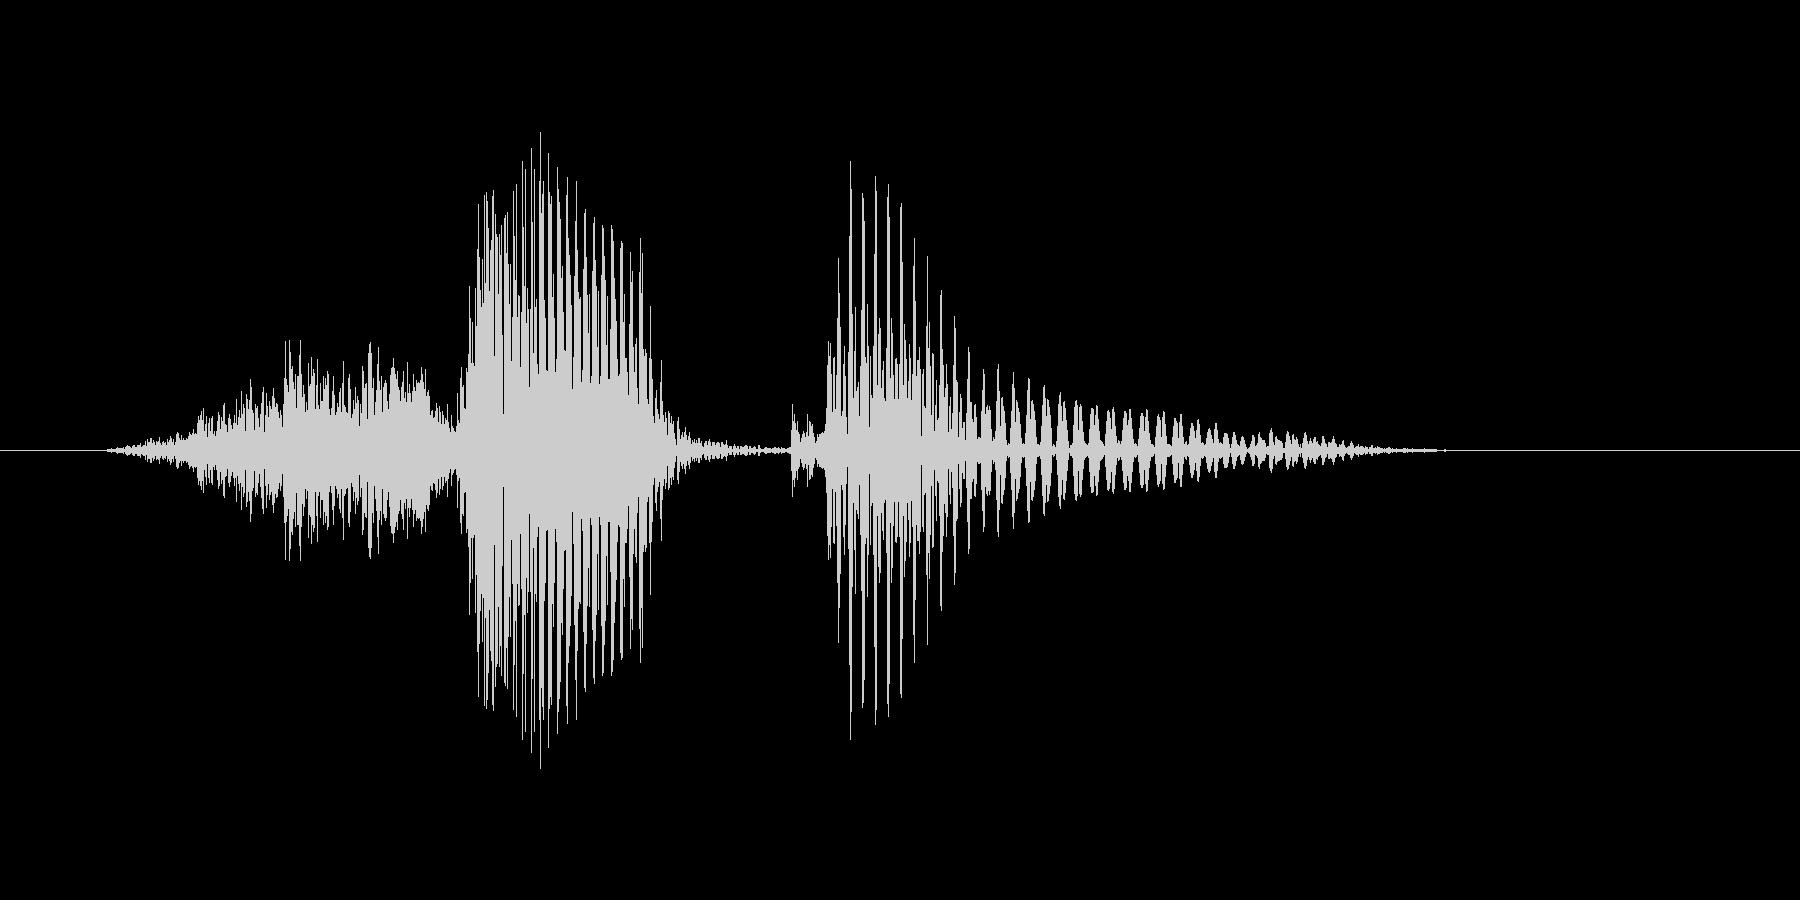 Second(セカンド)の未再生の波形